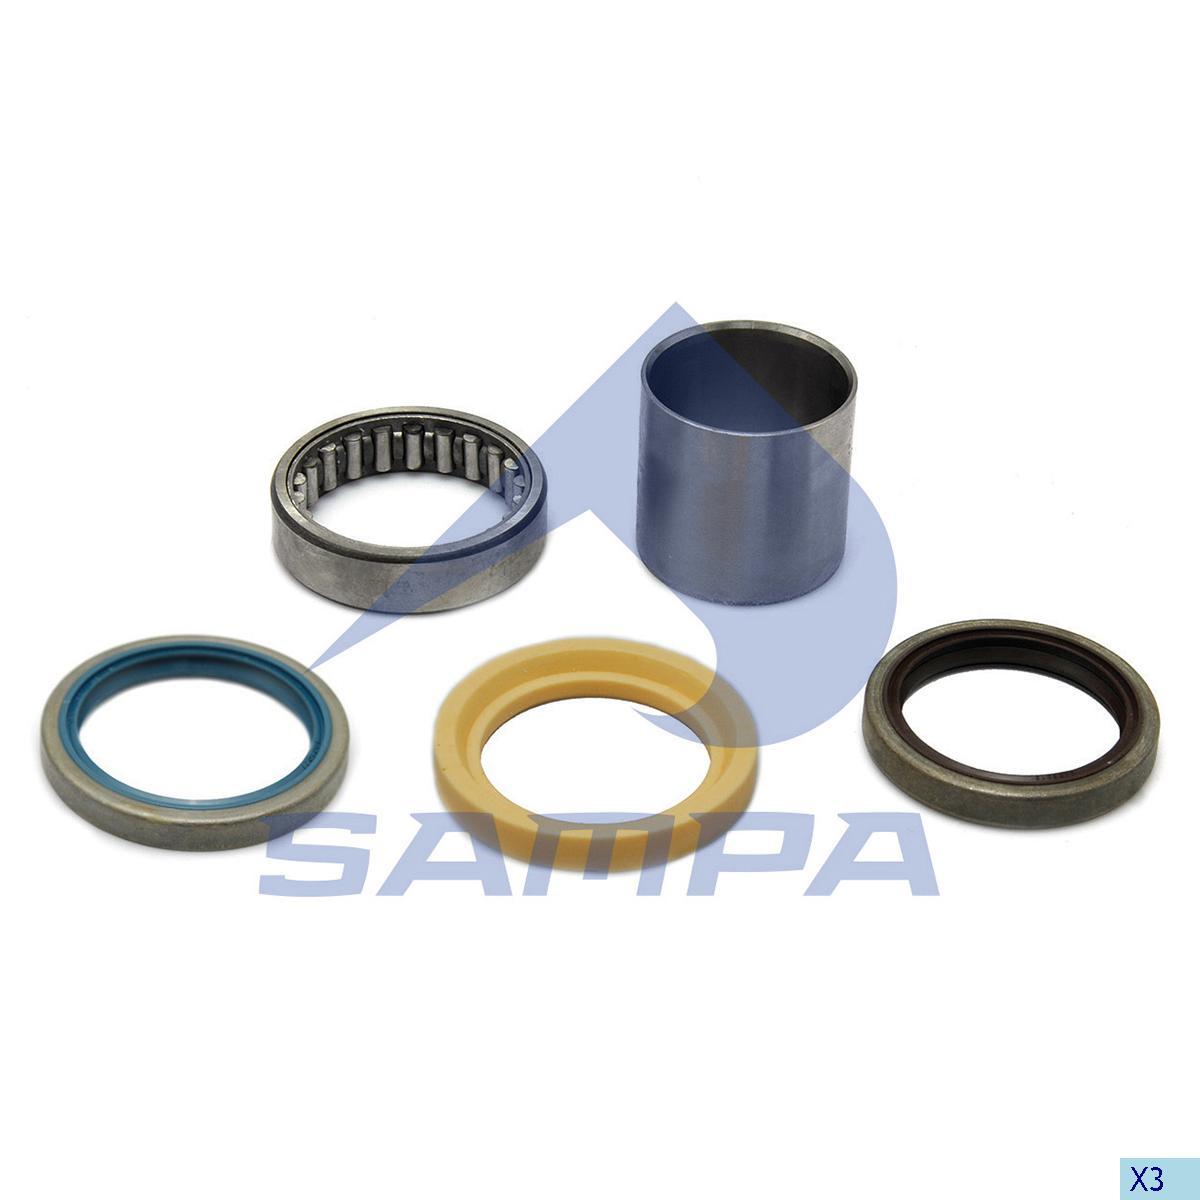 Repair Kit, Drive Shaft, Mercedes, Power Unit